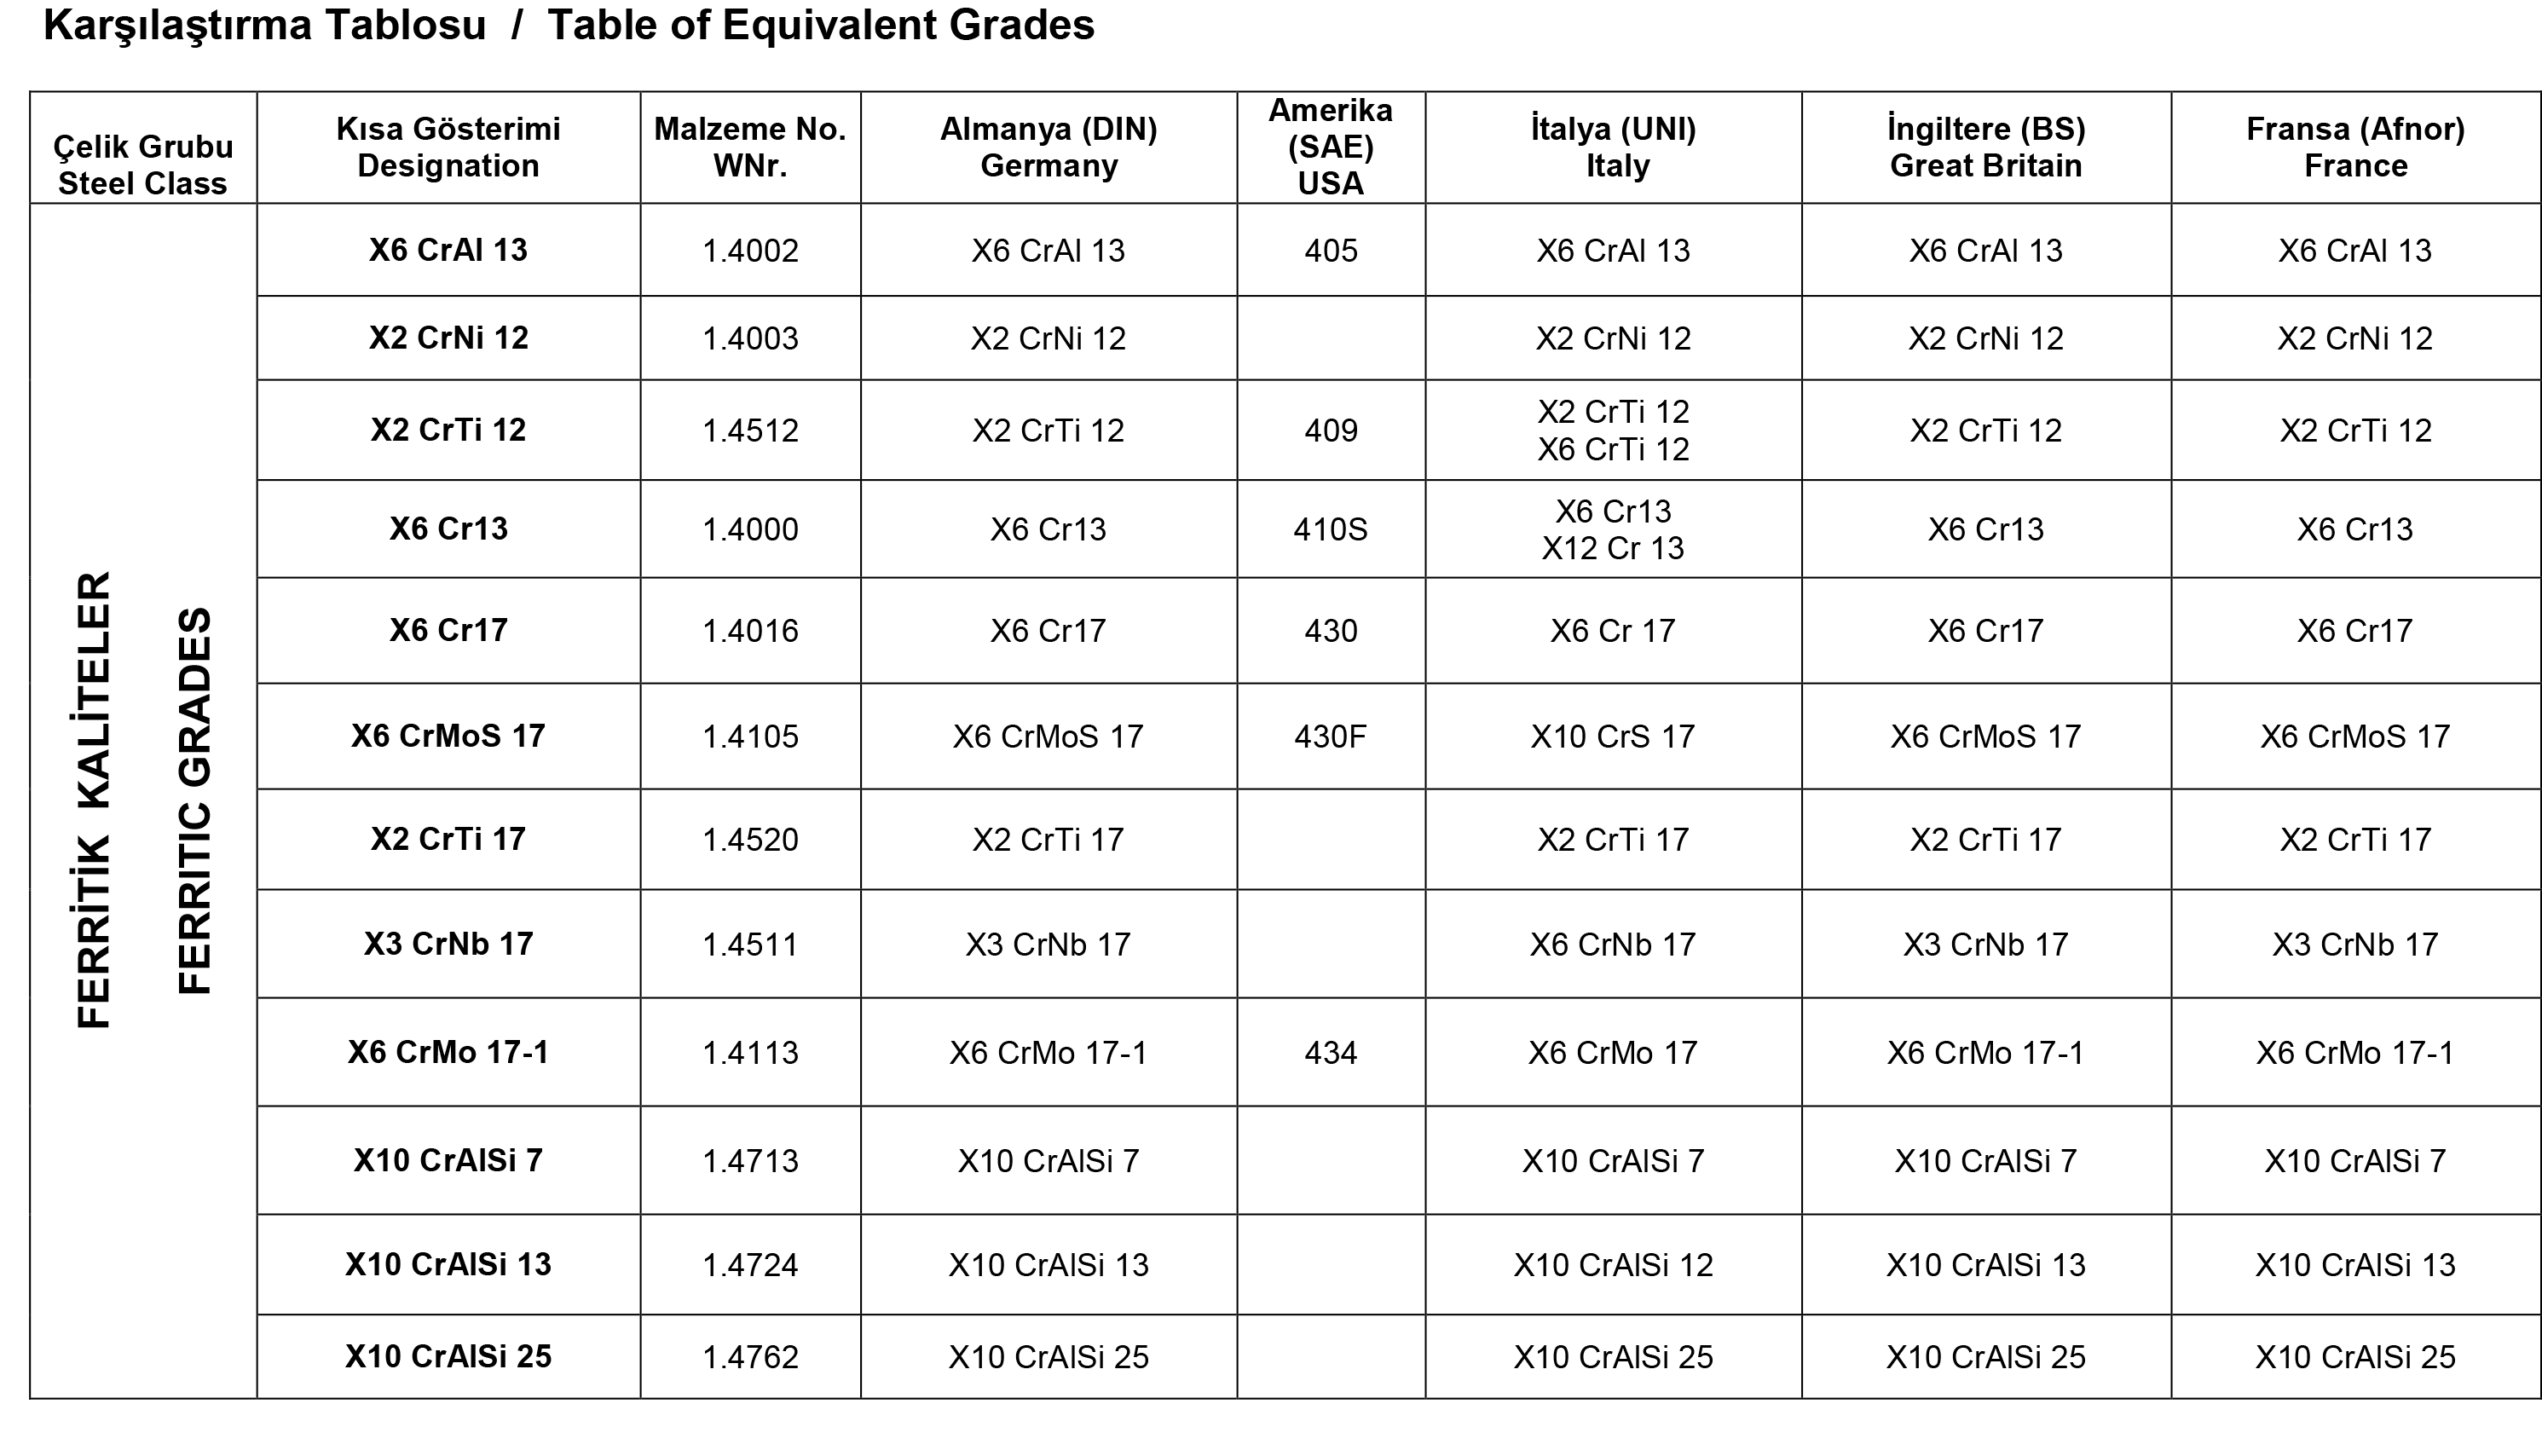 karsilastirma-tablosu-2